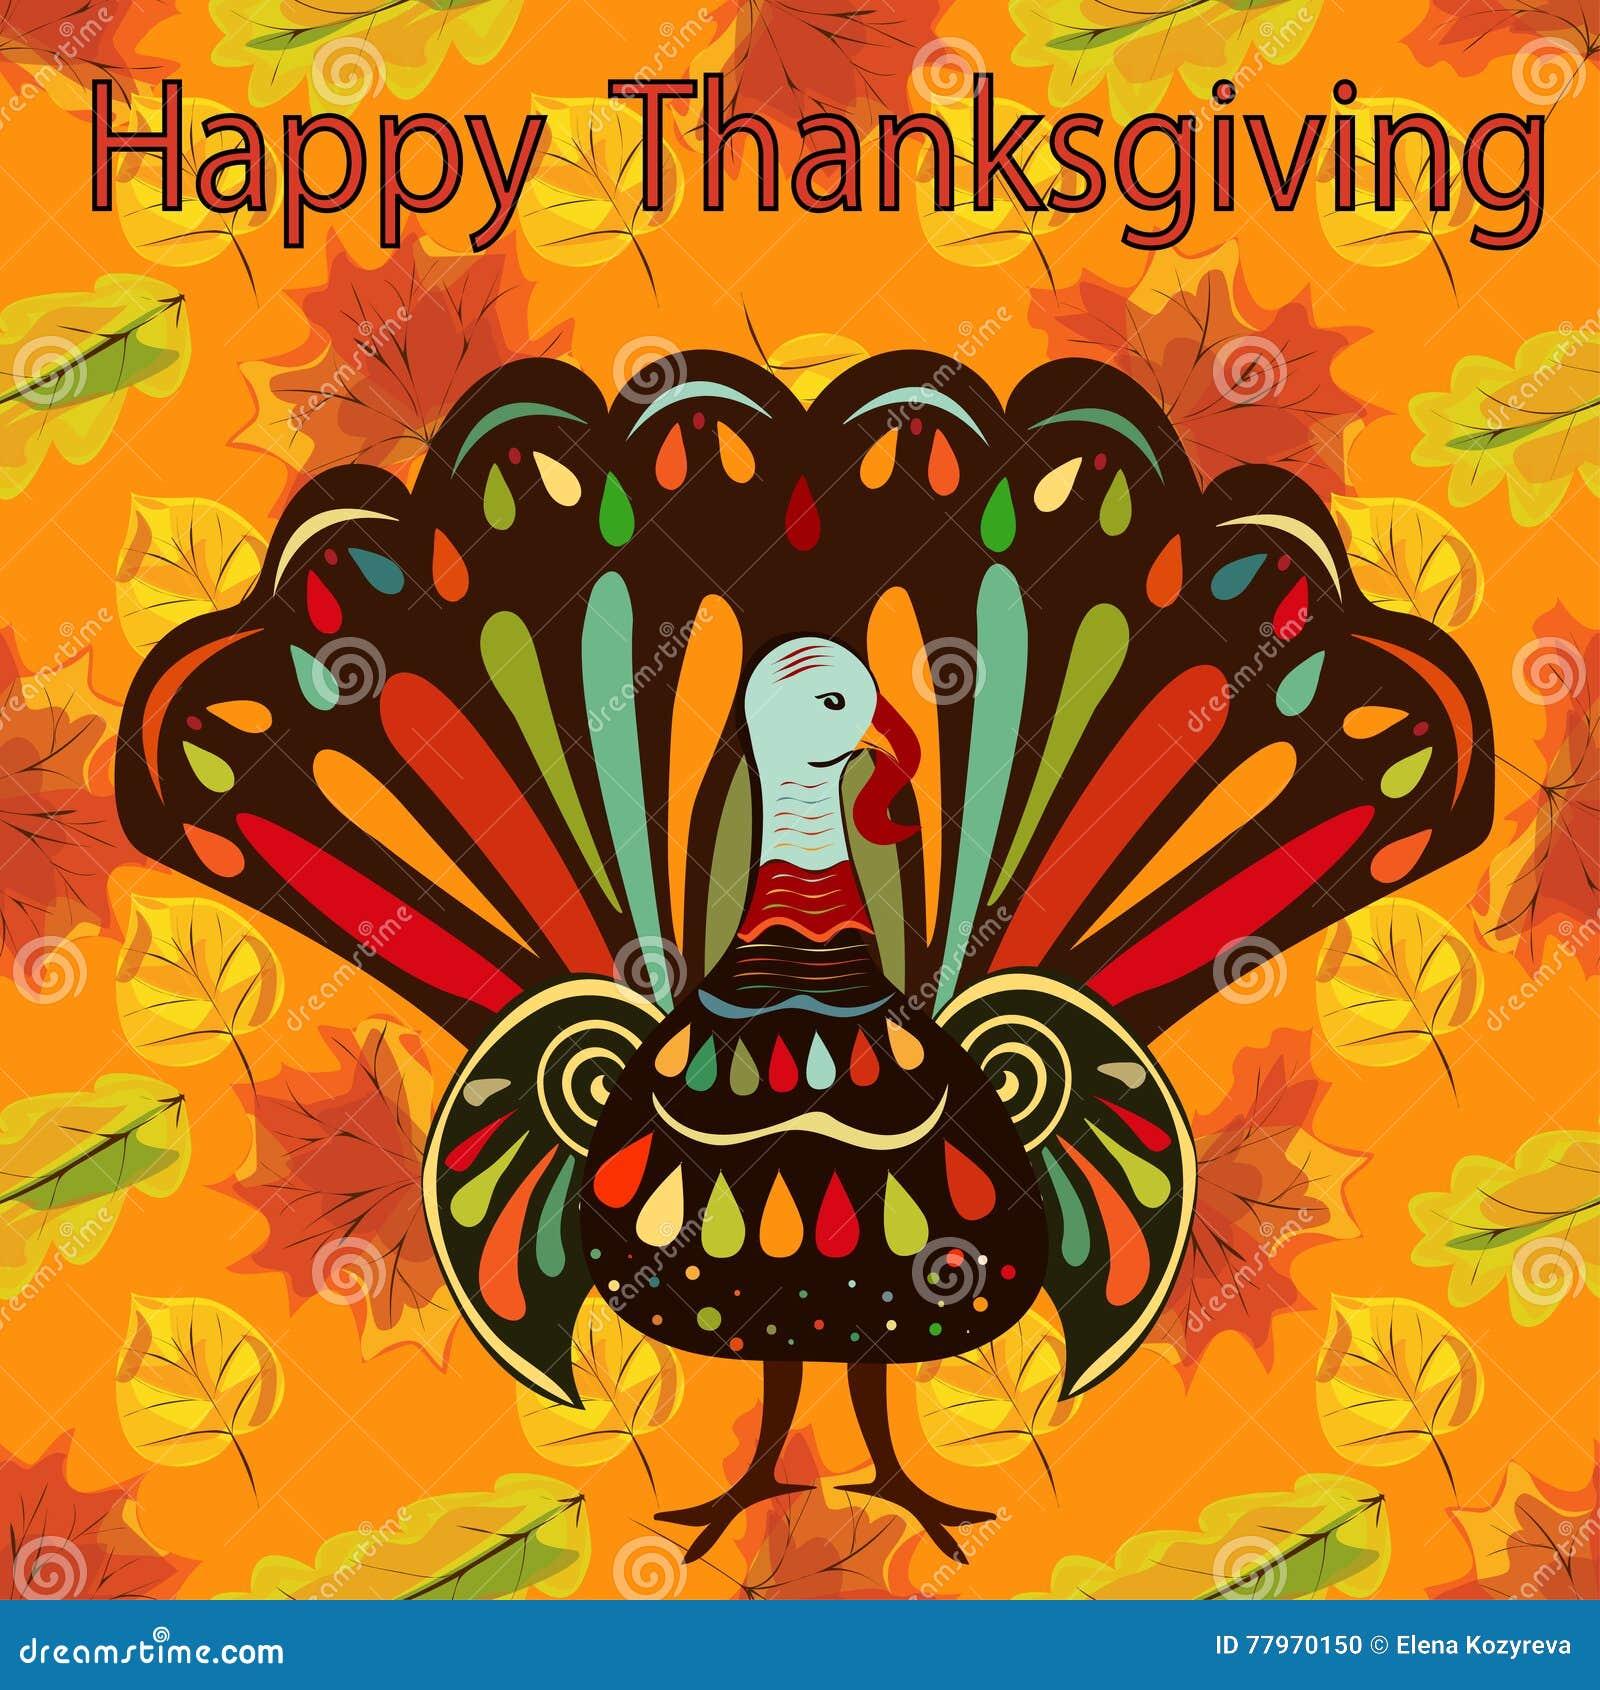 Happy Thanksgiving Beautiful Colorful Ethnic Turkey Bird ...